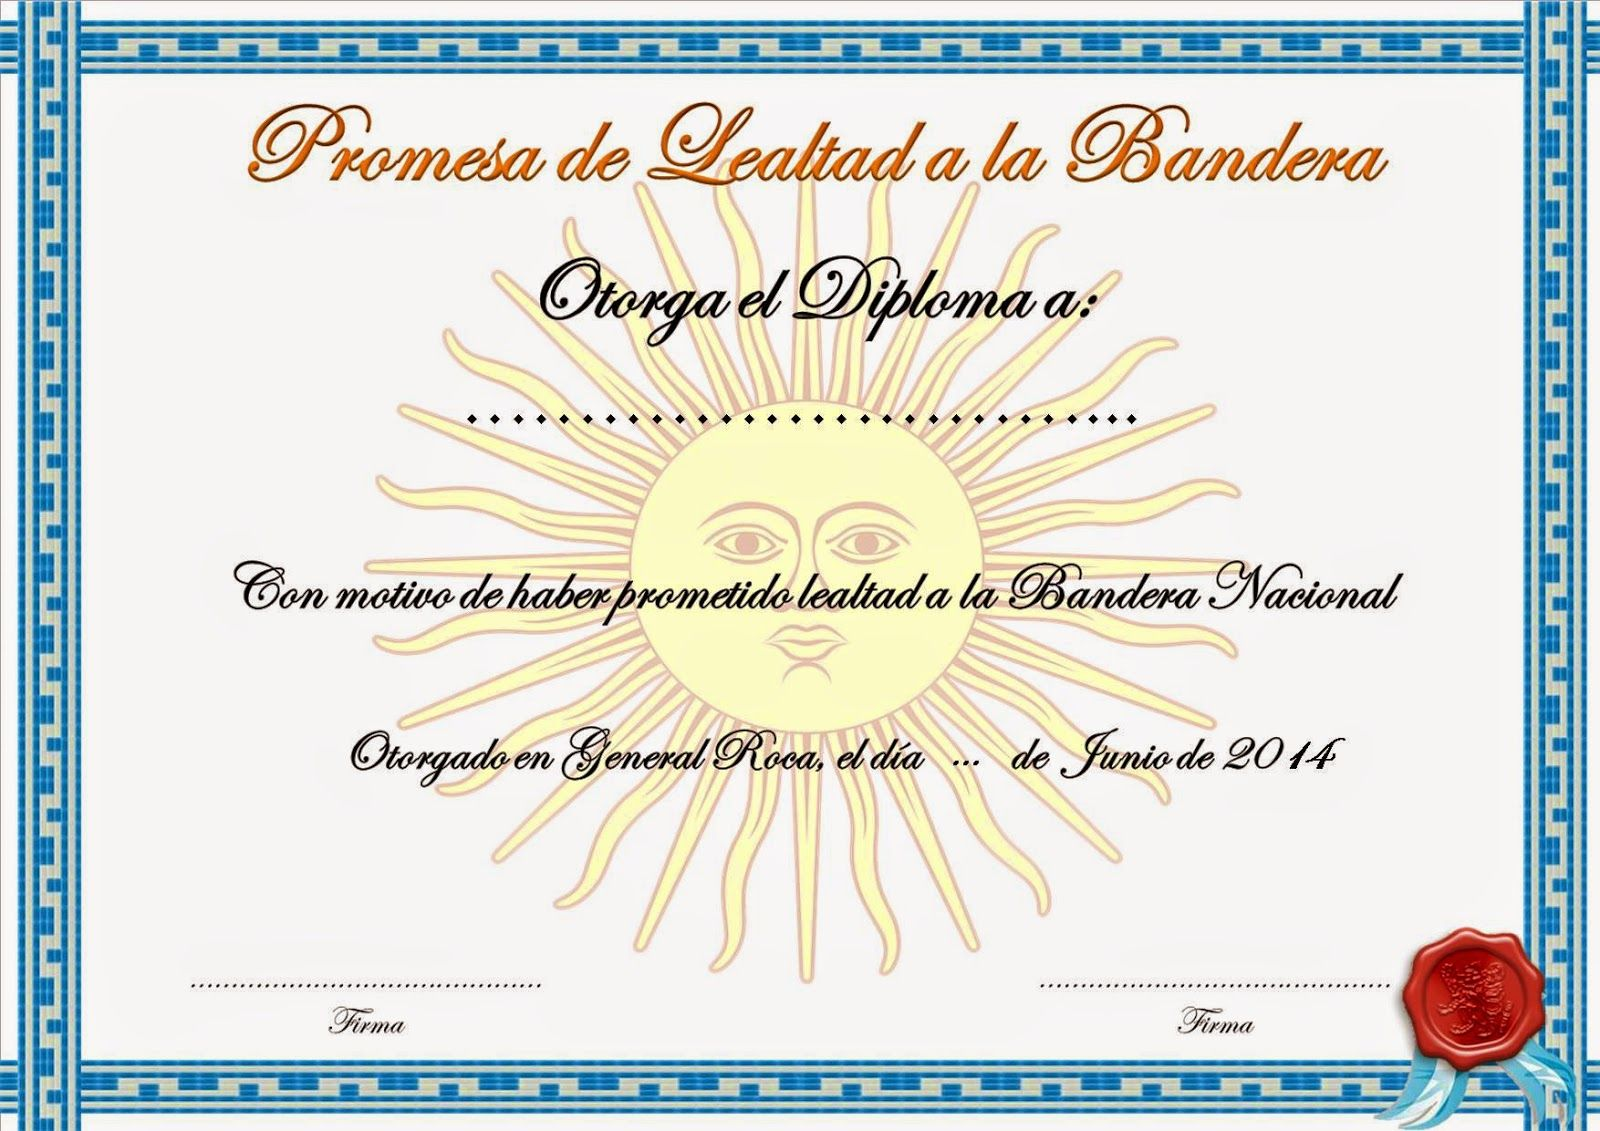 Supervisión de Educación Primaria AVE I: Diploma de Promesa de ...